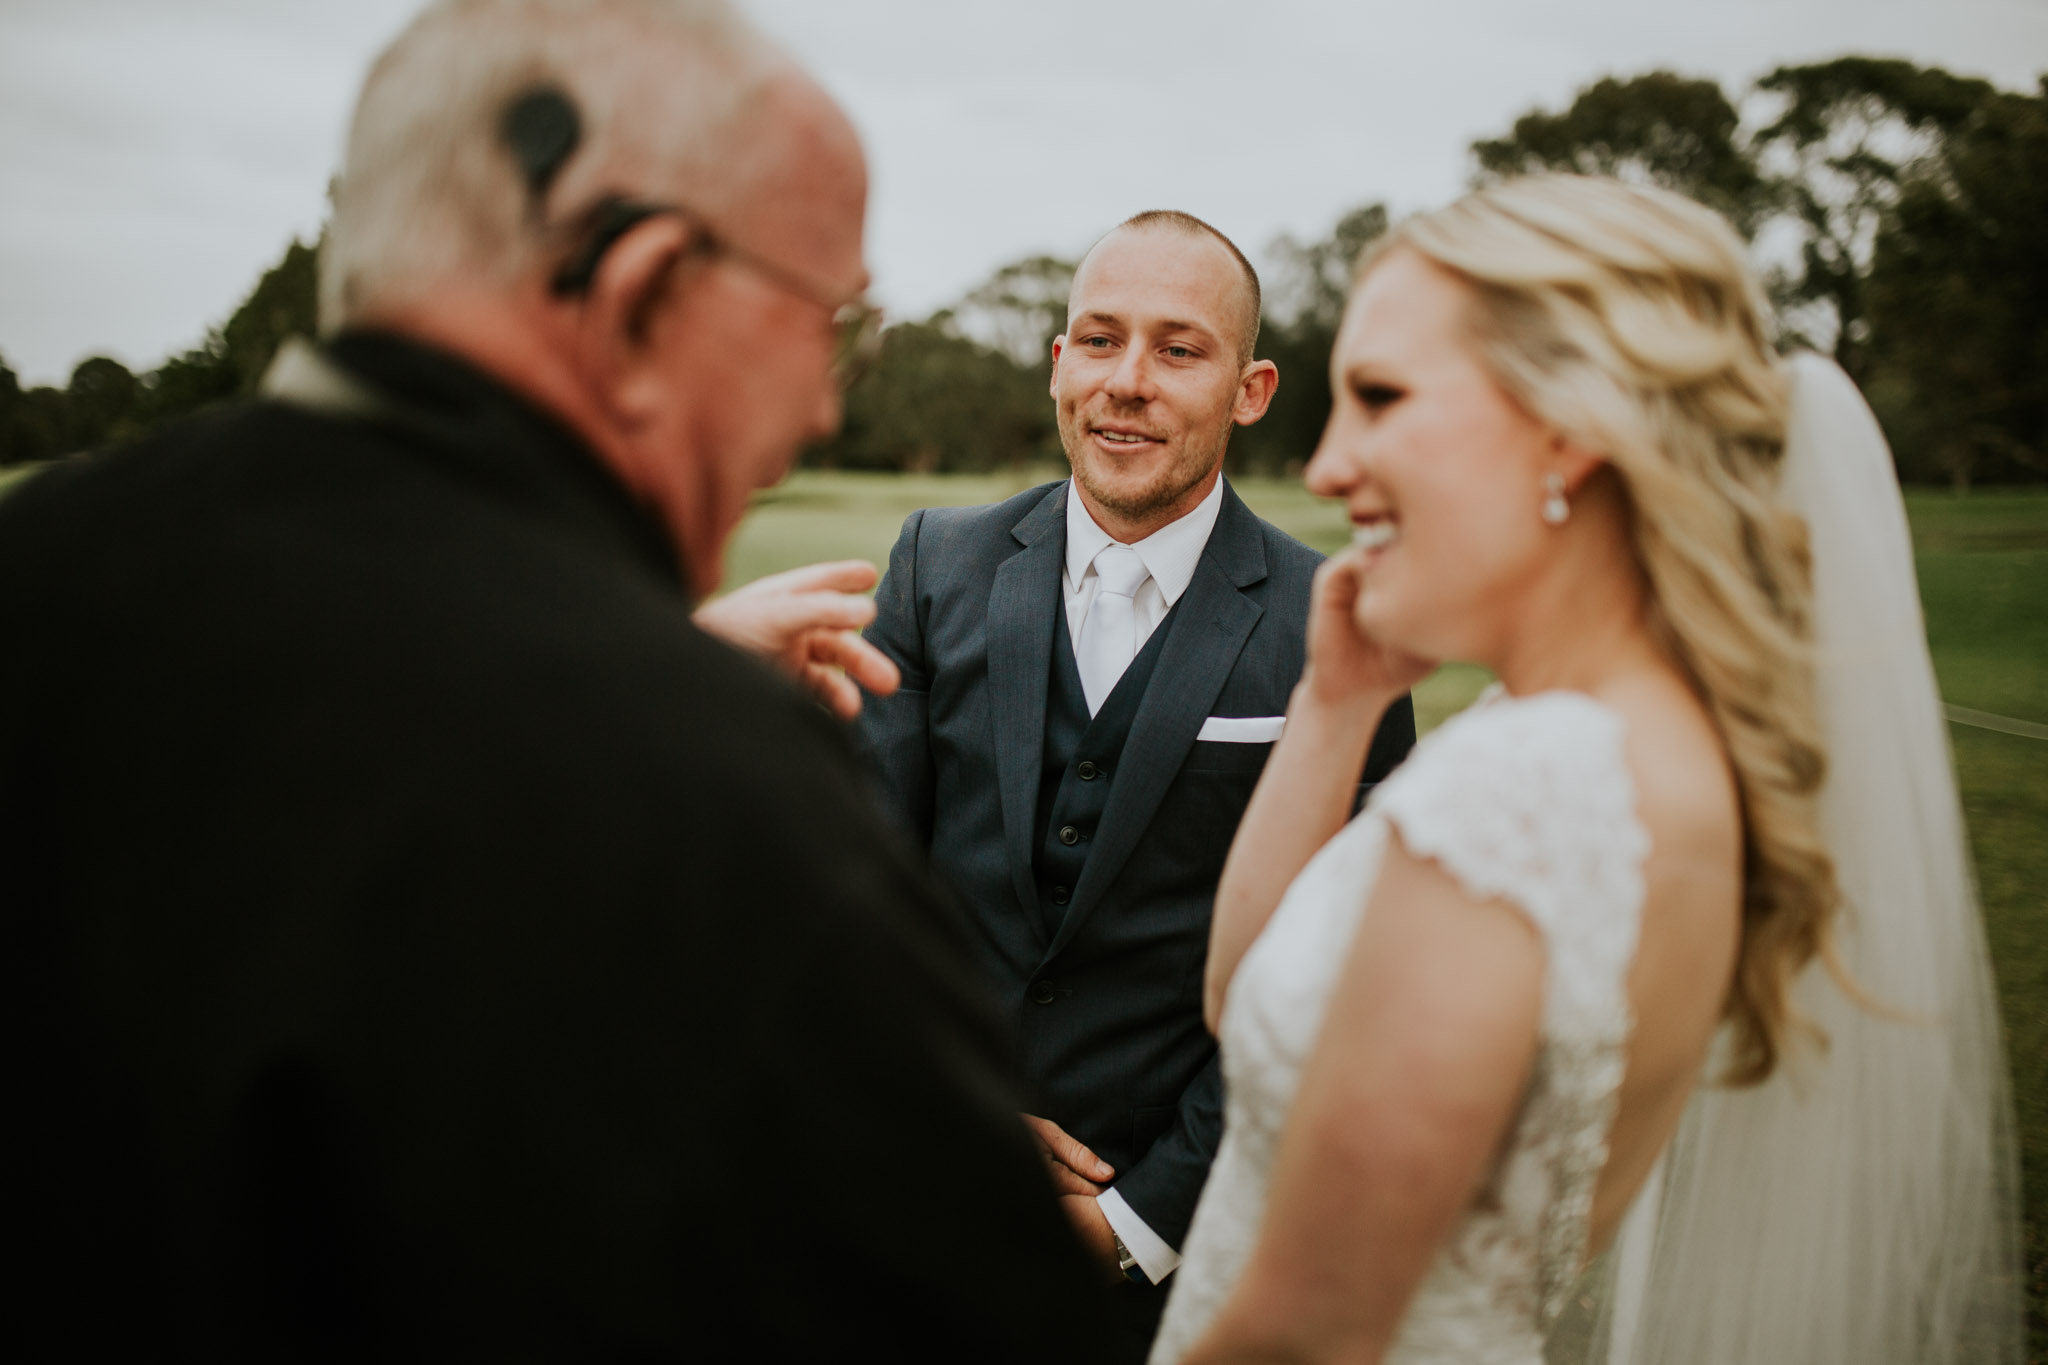 Shanan & Traci_Portkembla Golf Course Wedding-38.jpg